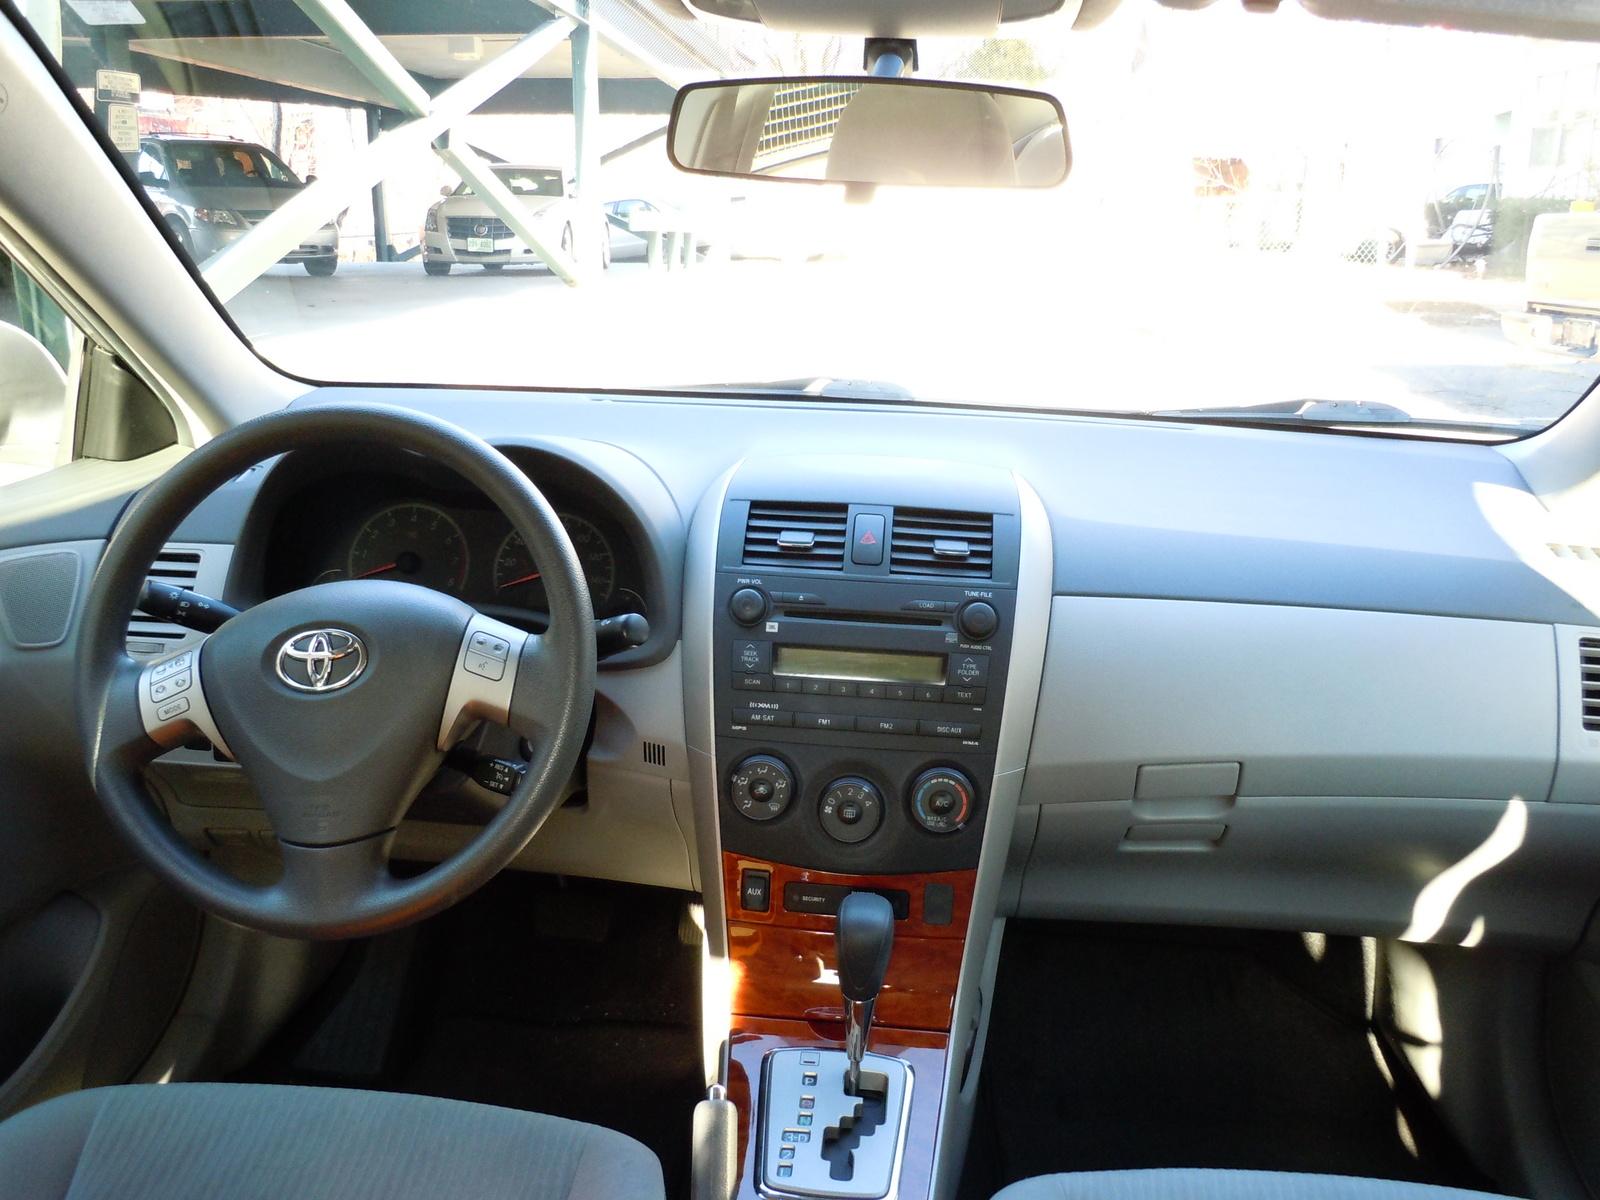 Toyota Corolla Xle Pic